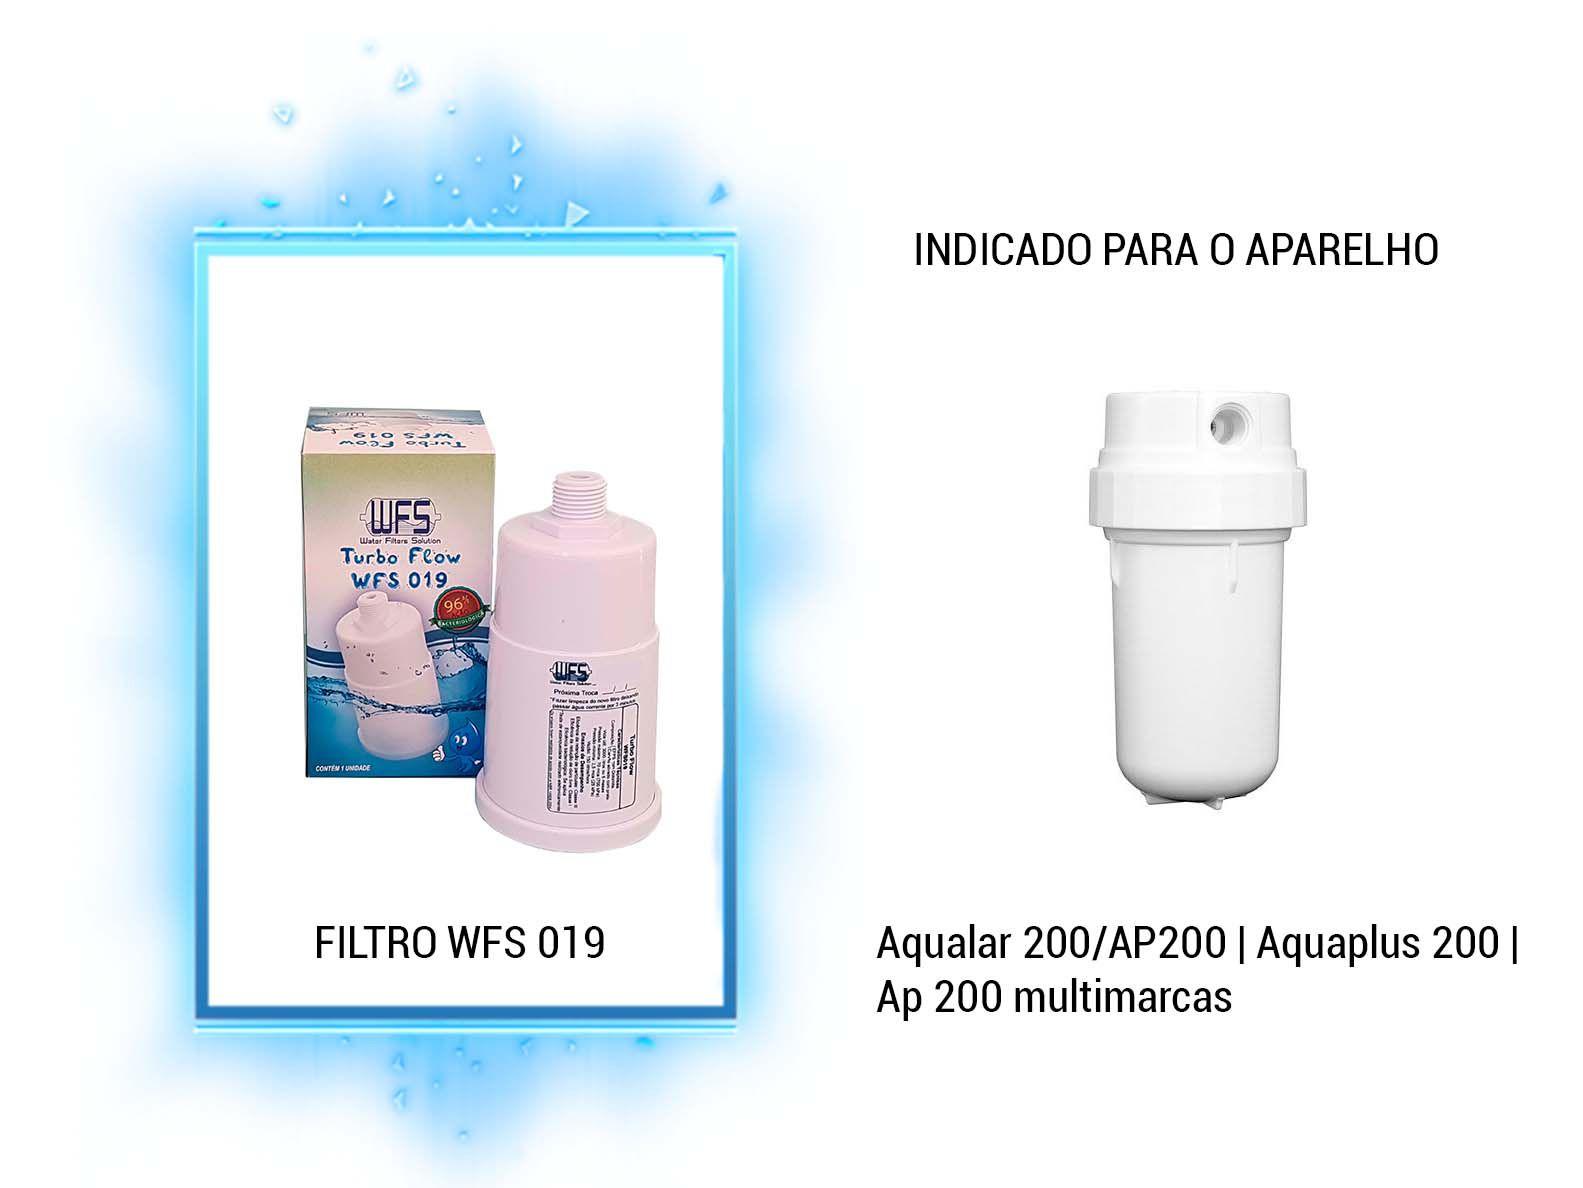 Refil Purificador Aqualar 200/ap200  Wfs 019   Turbo Flow